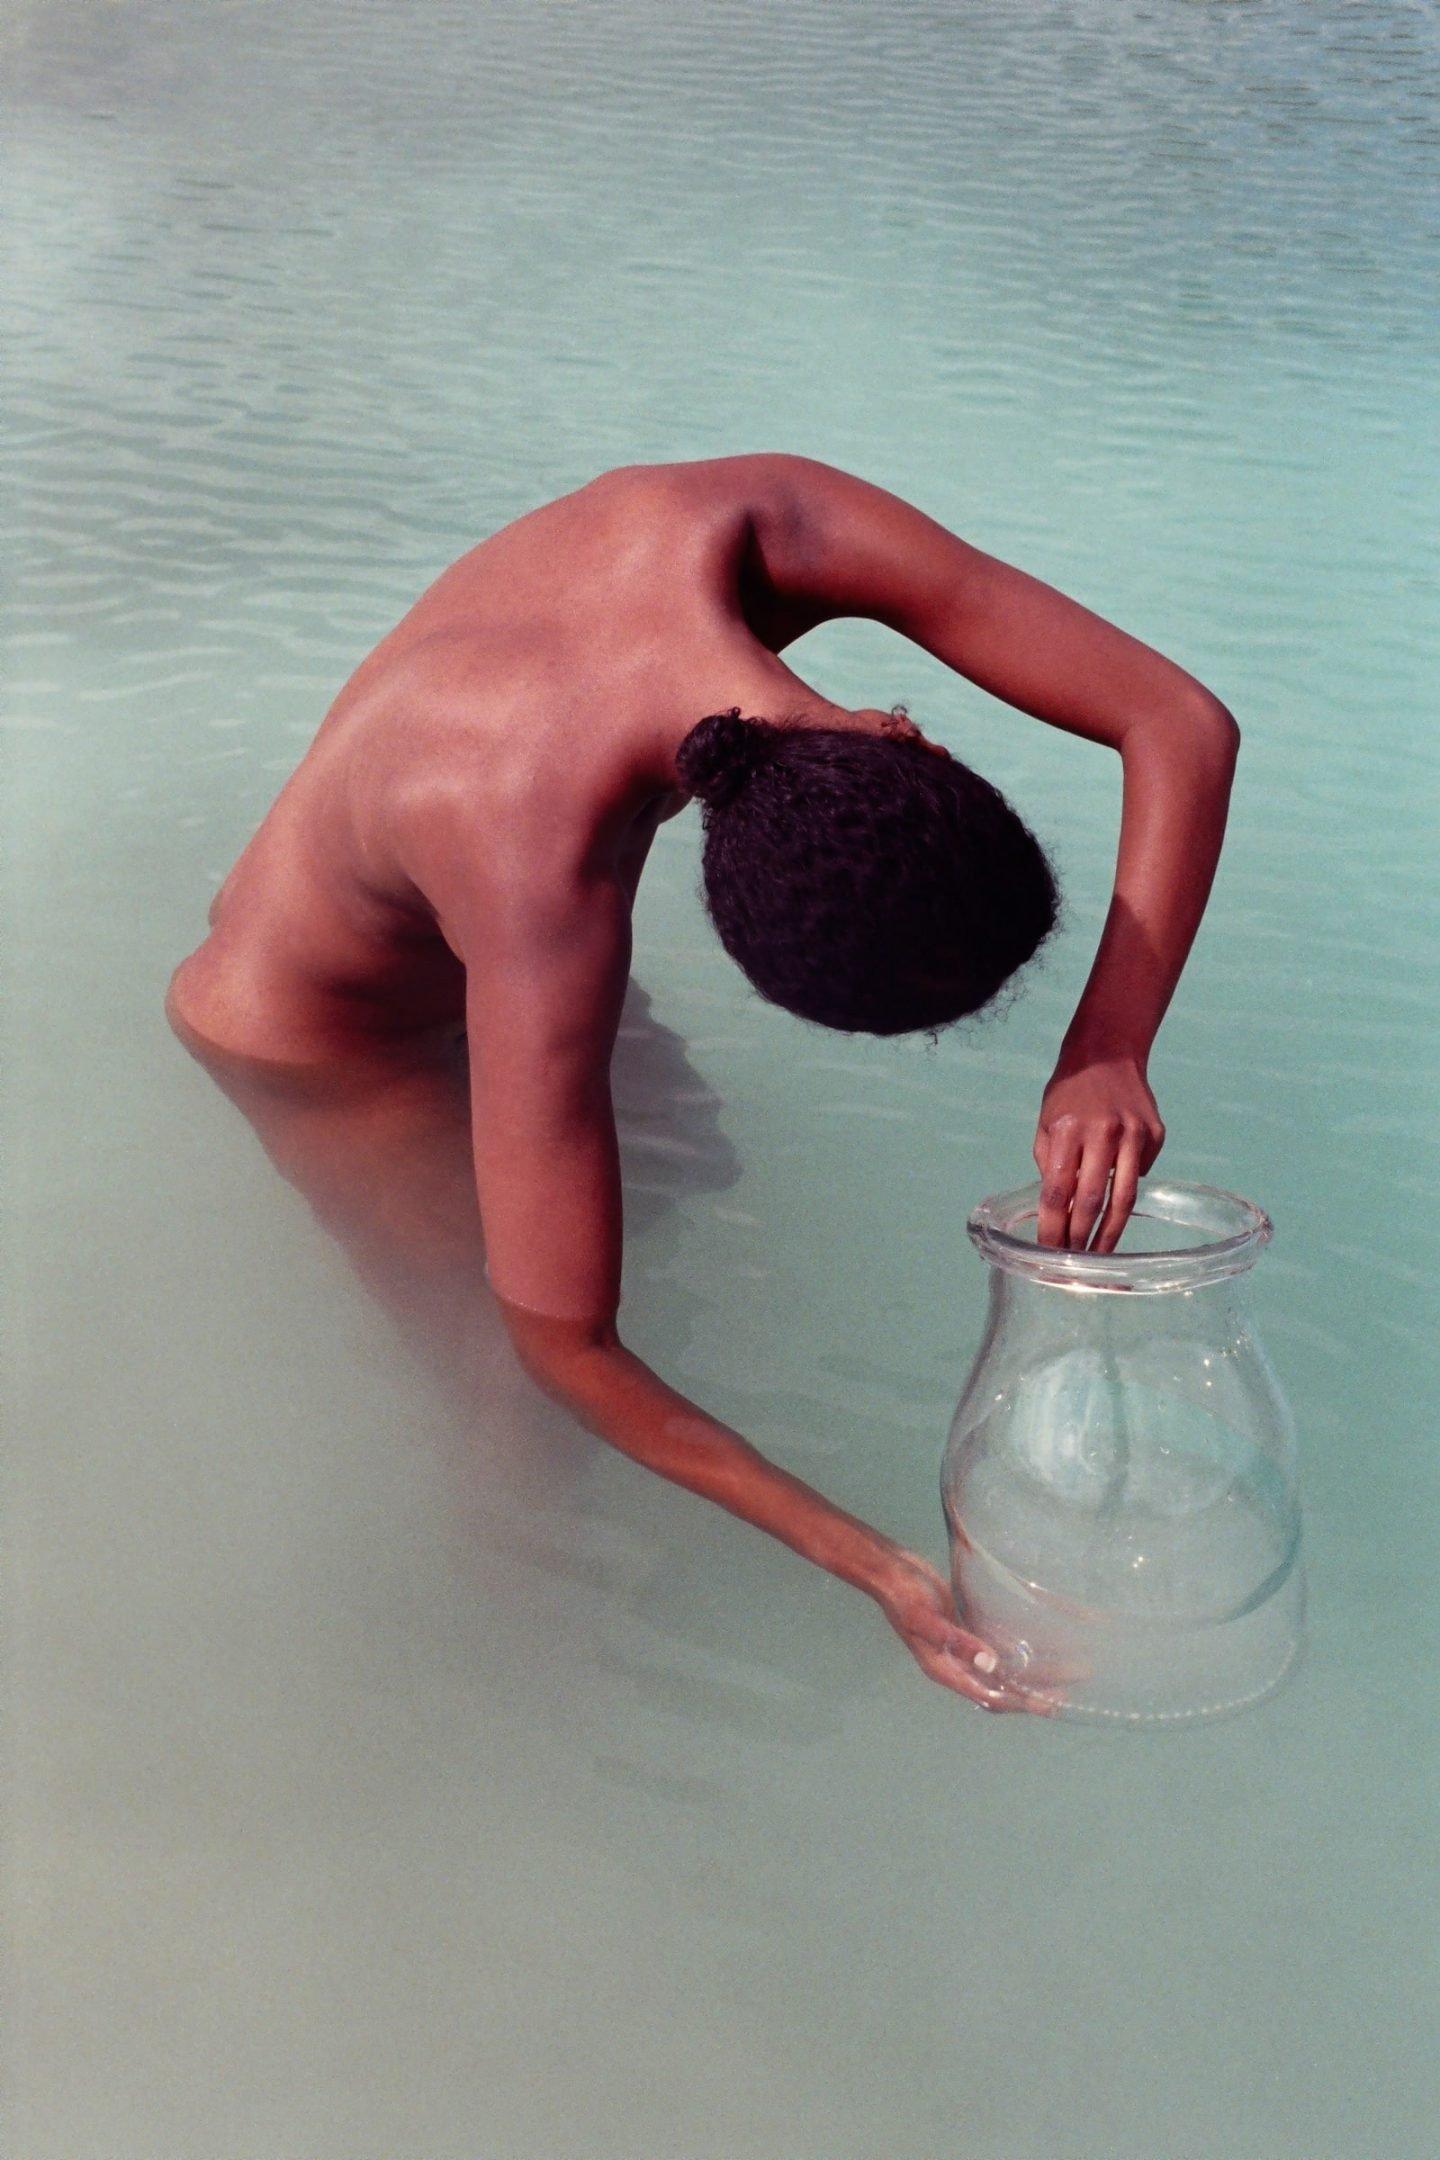 IGNANT-Photography-Denisse-Ariana-Pérez-Agua-04